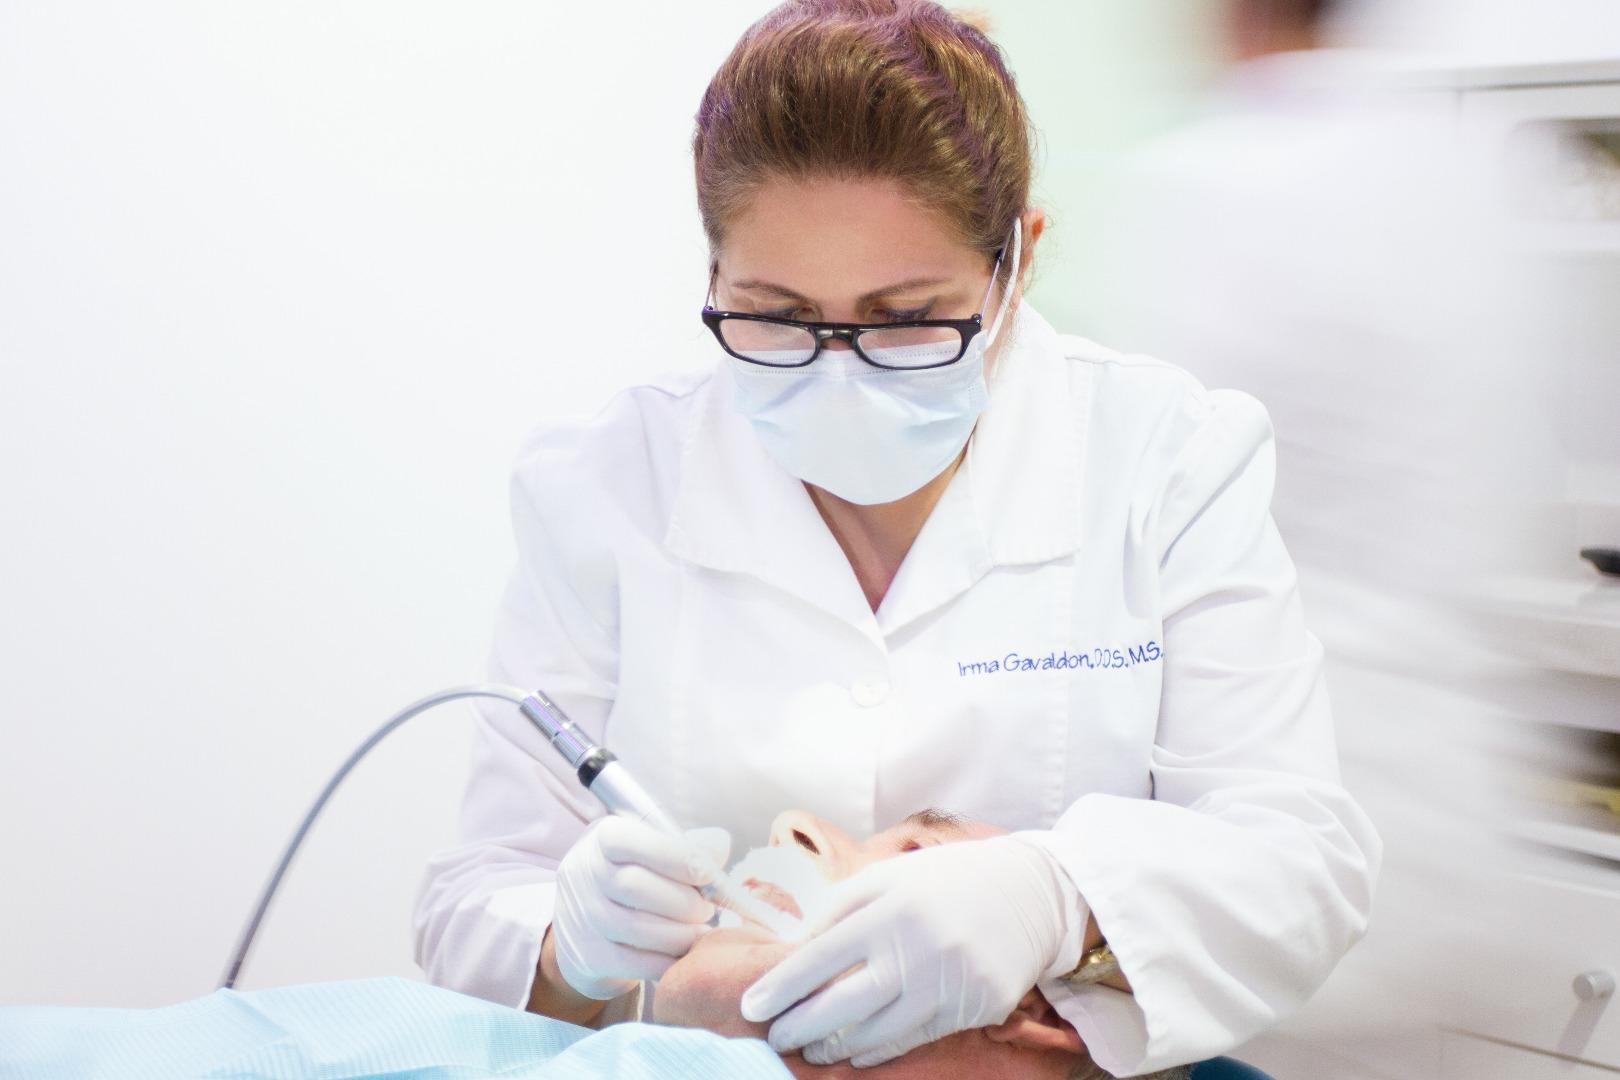 Dr. gavaldon 1